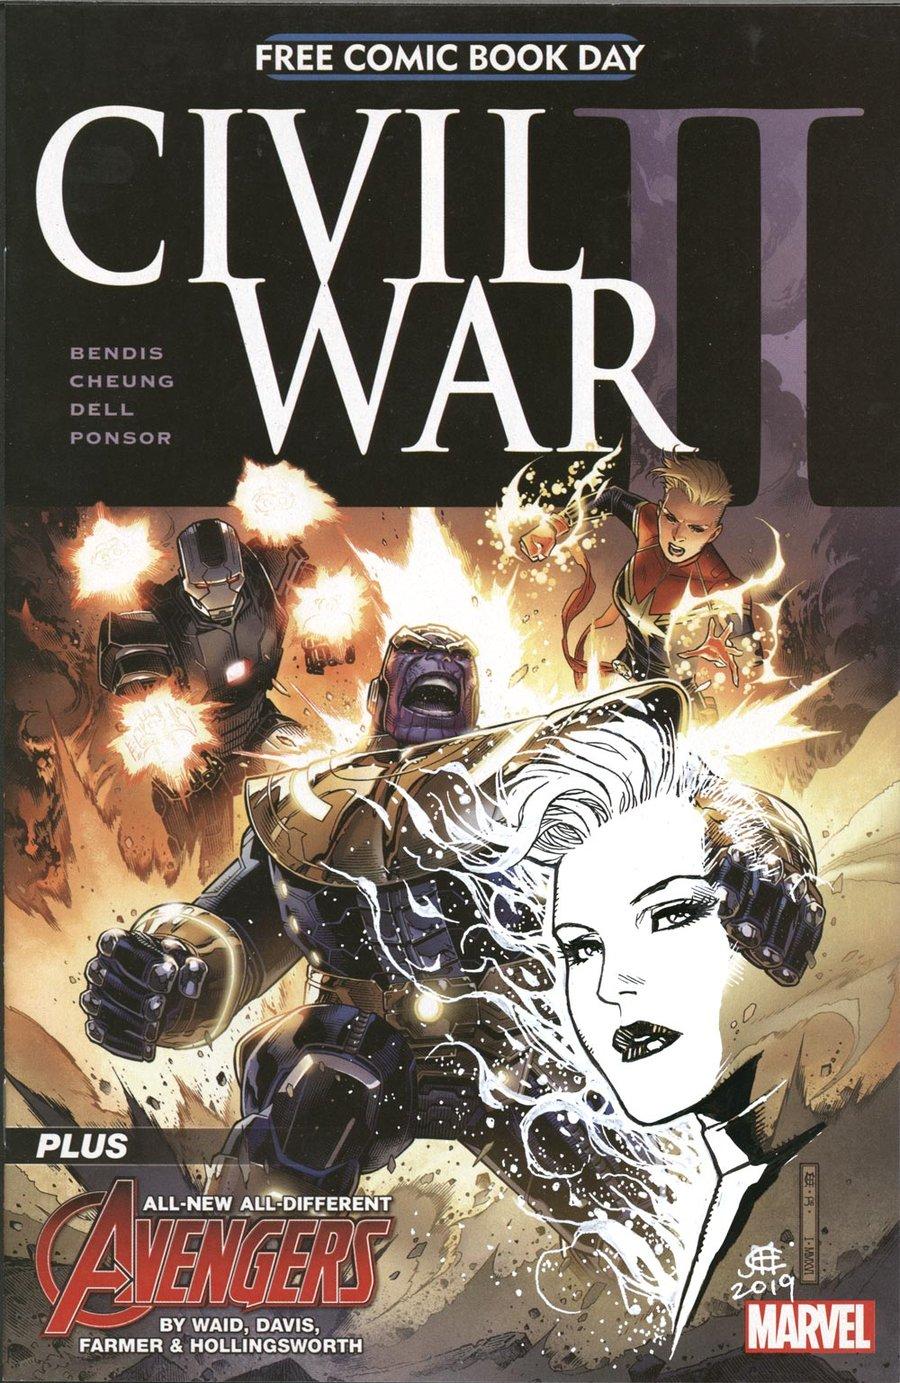 Image of CIVIL WAR II - FCBD - Captain Marvel Remarque